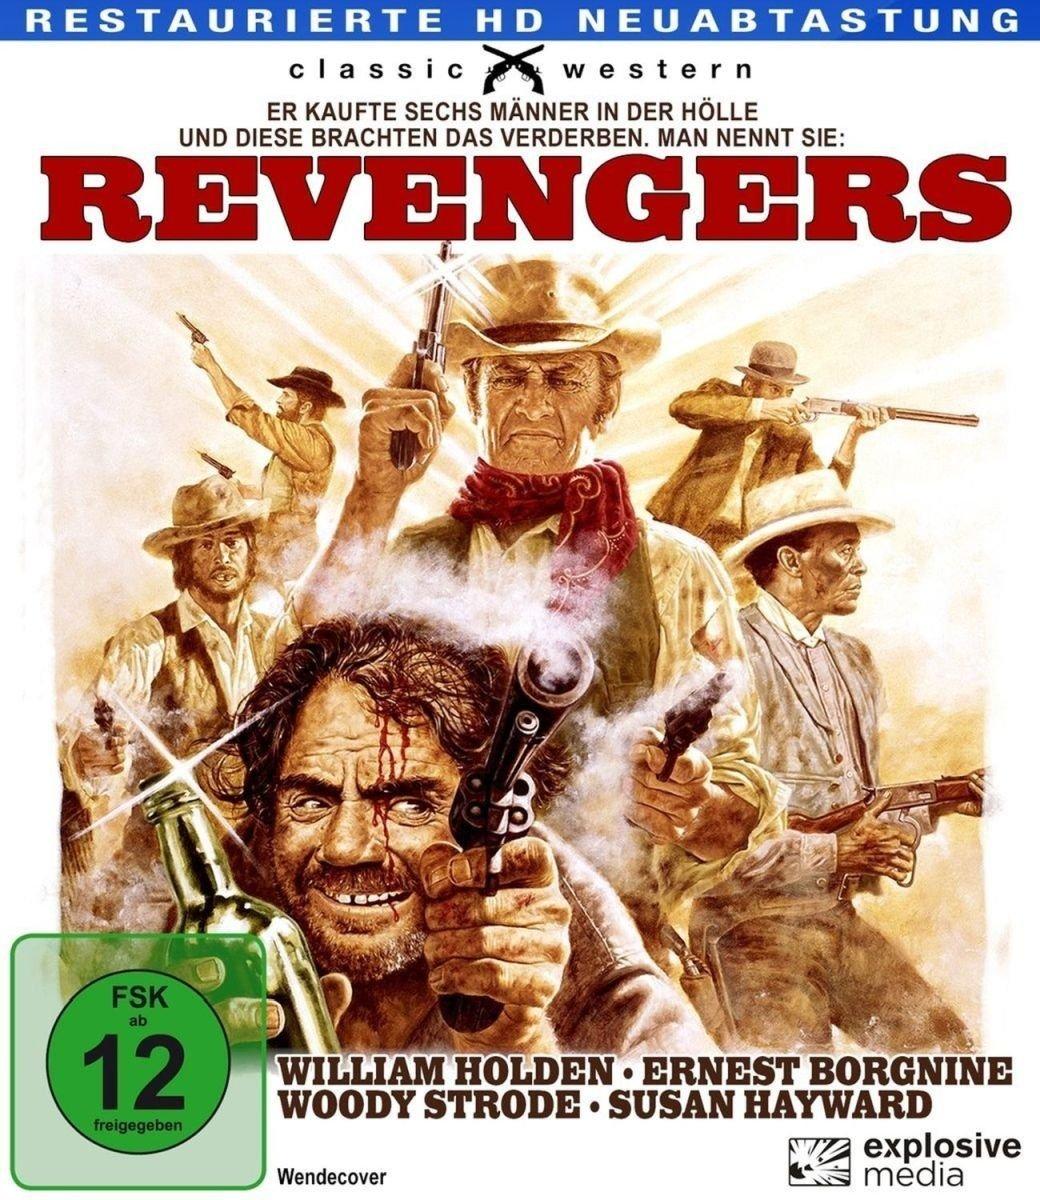 The Revengers (1972) Western